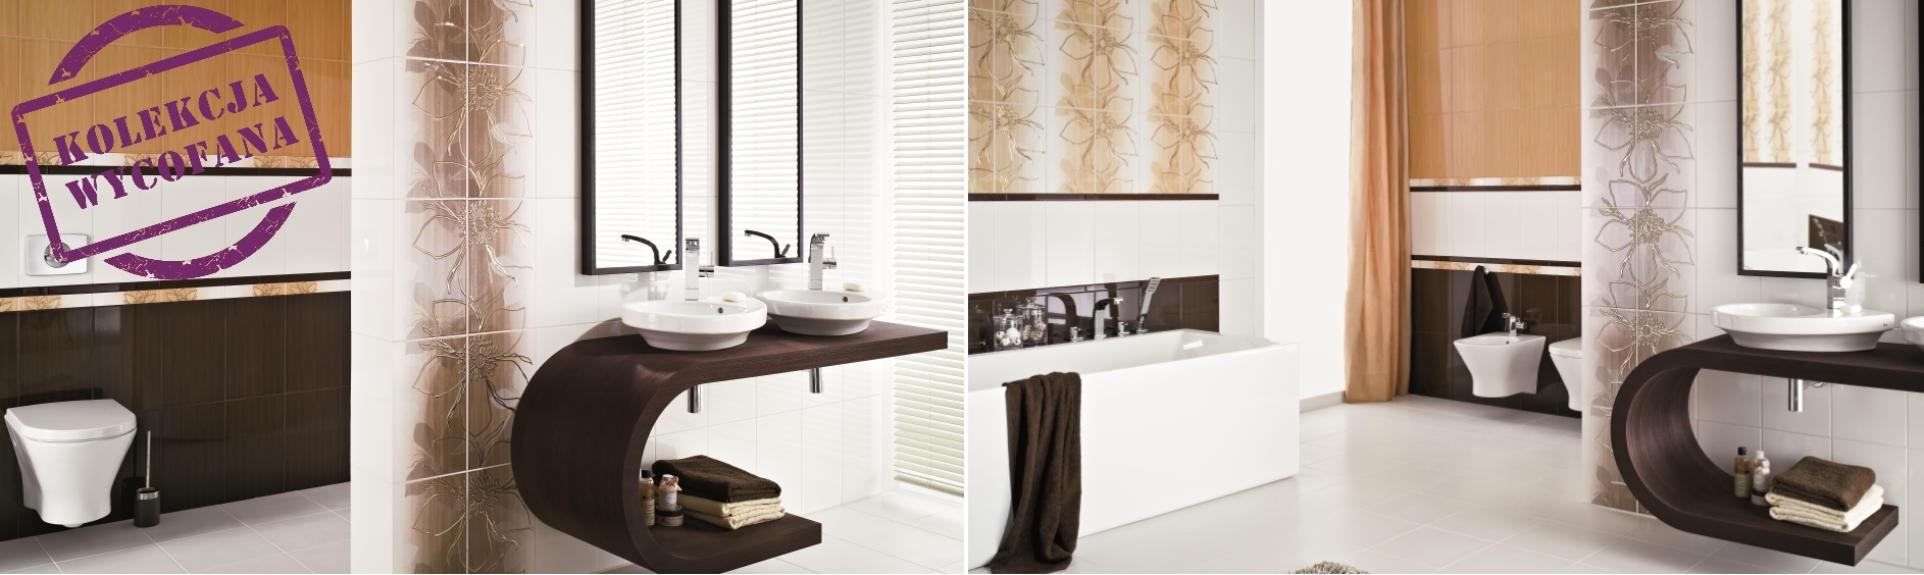 Ambrozja / Vivido (WYCOFANE) - Kuchnia, Łazienka, Salon, Przedpokój